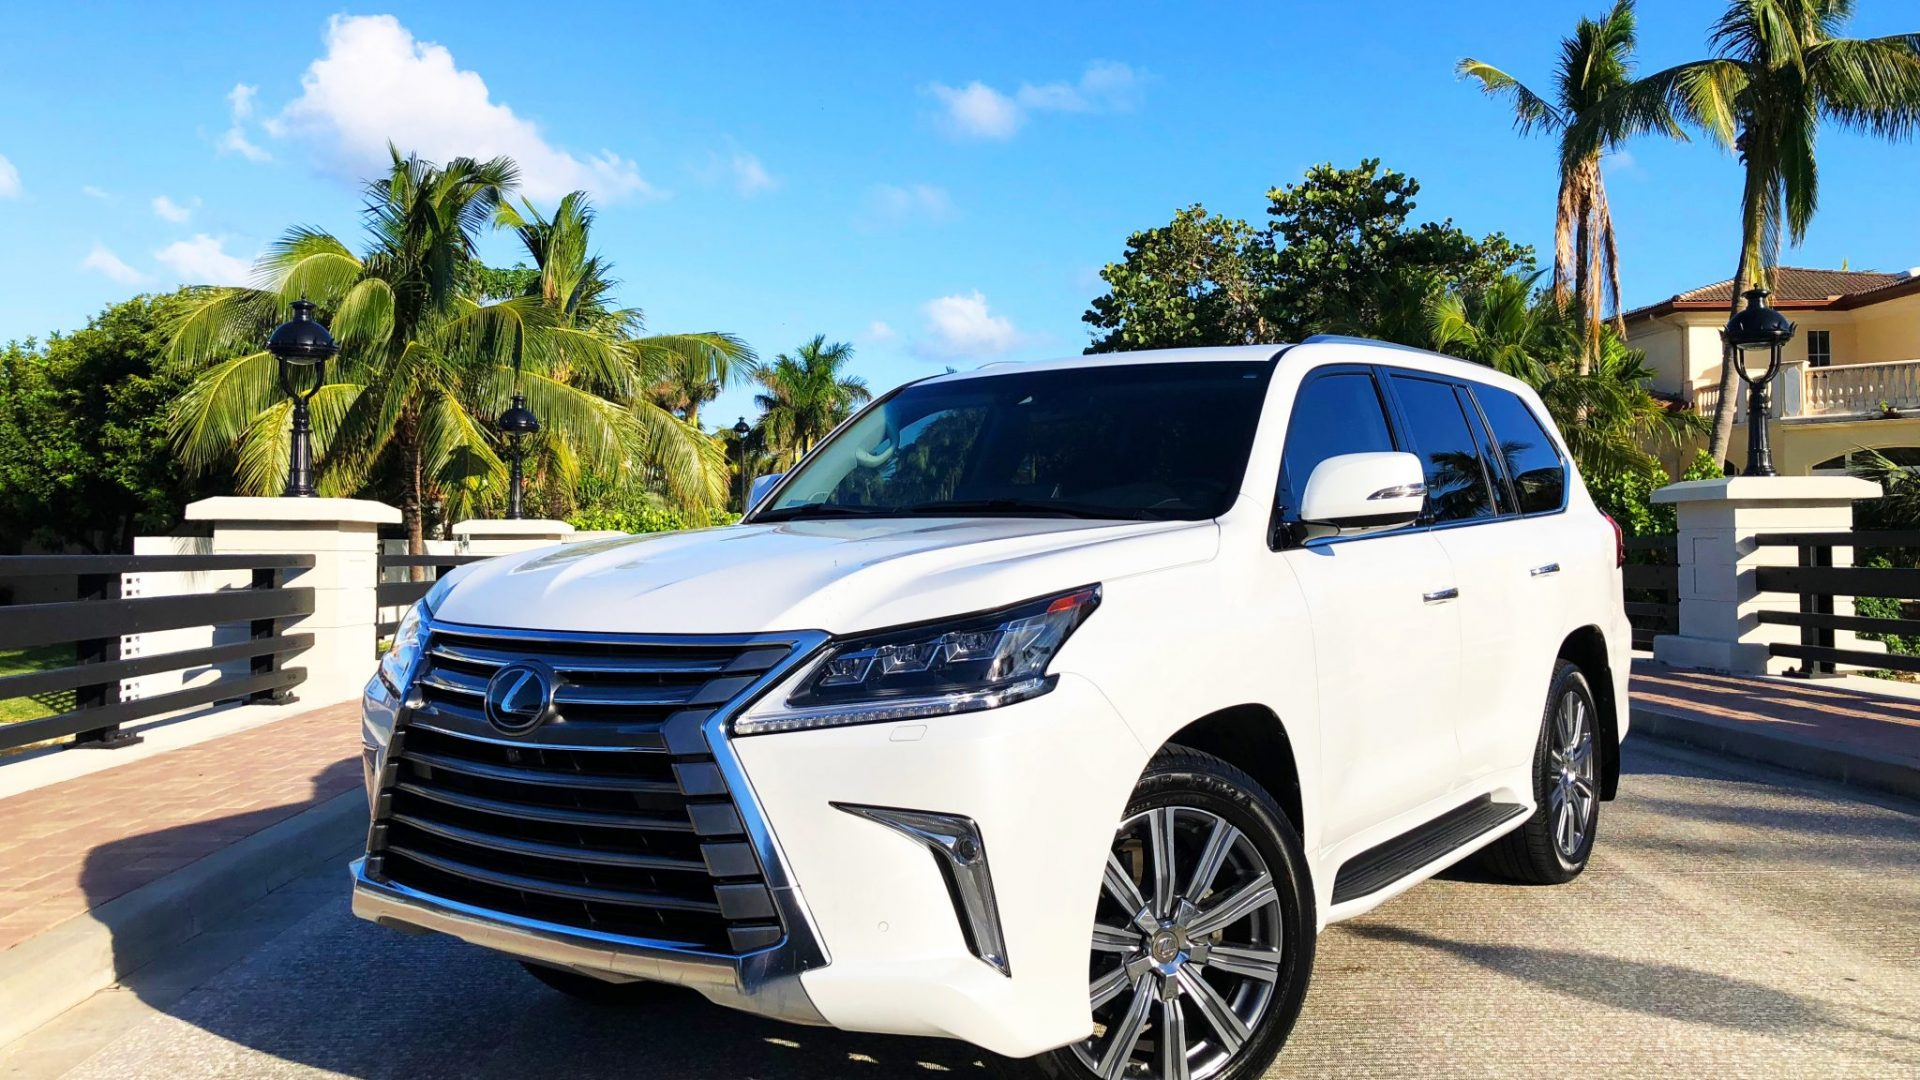 https://www.topspeedexotics.com/wp-content/uploads/2017/12/Lexus-LX570-Rental-Miami-1920x1080.jpg